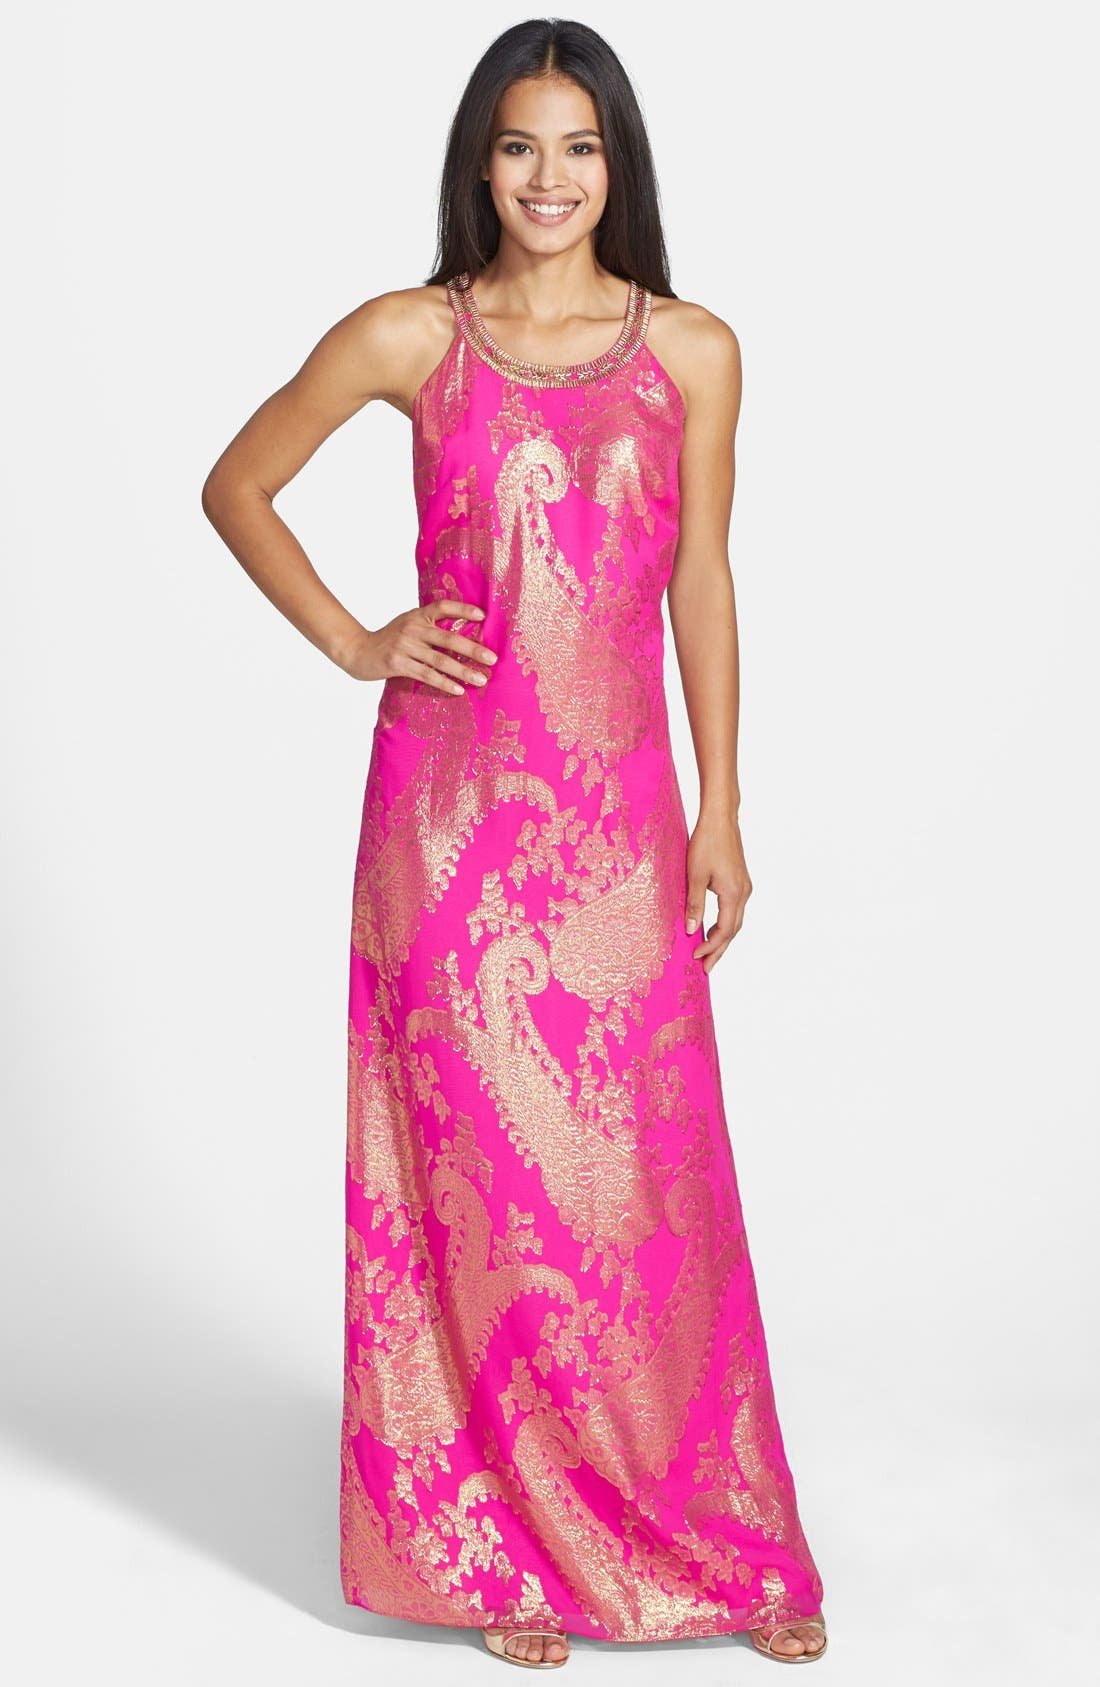 Main Image - Lilly Pulitzer® 'Franconia' Beaded Neck Metallic Jacquard Maxi Dress